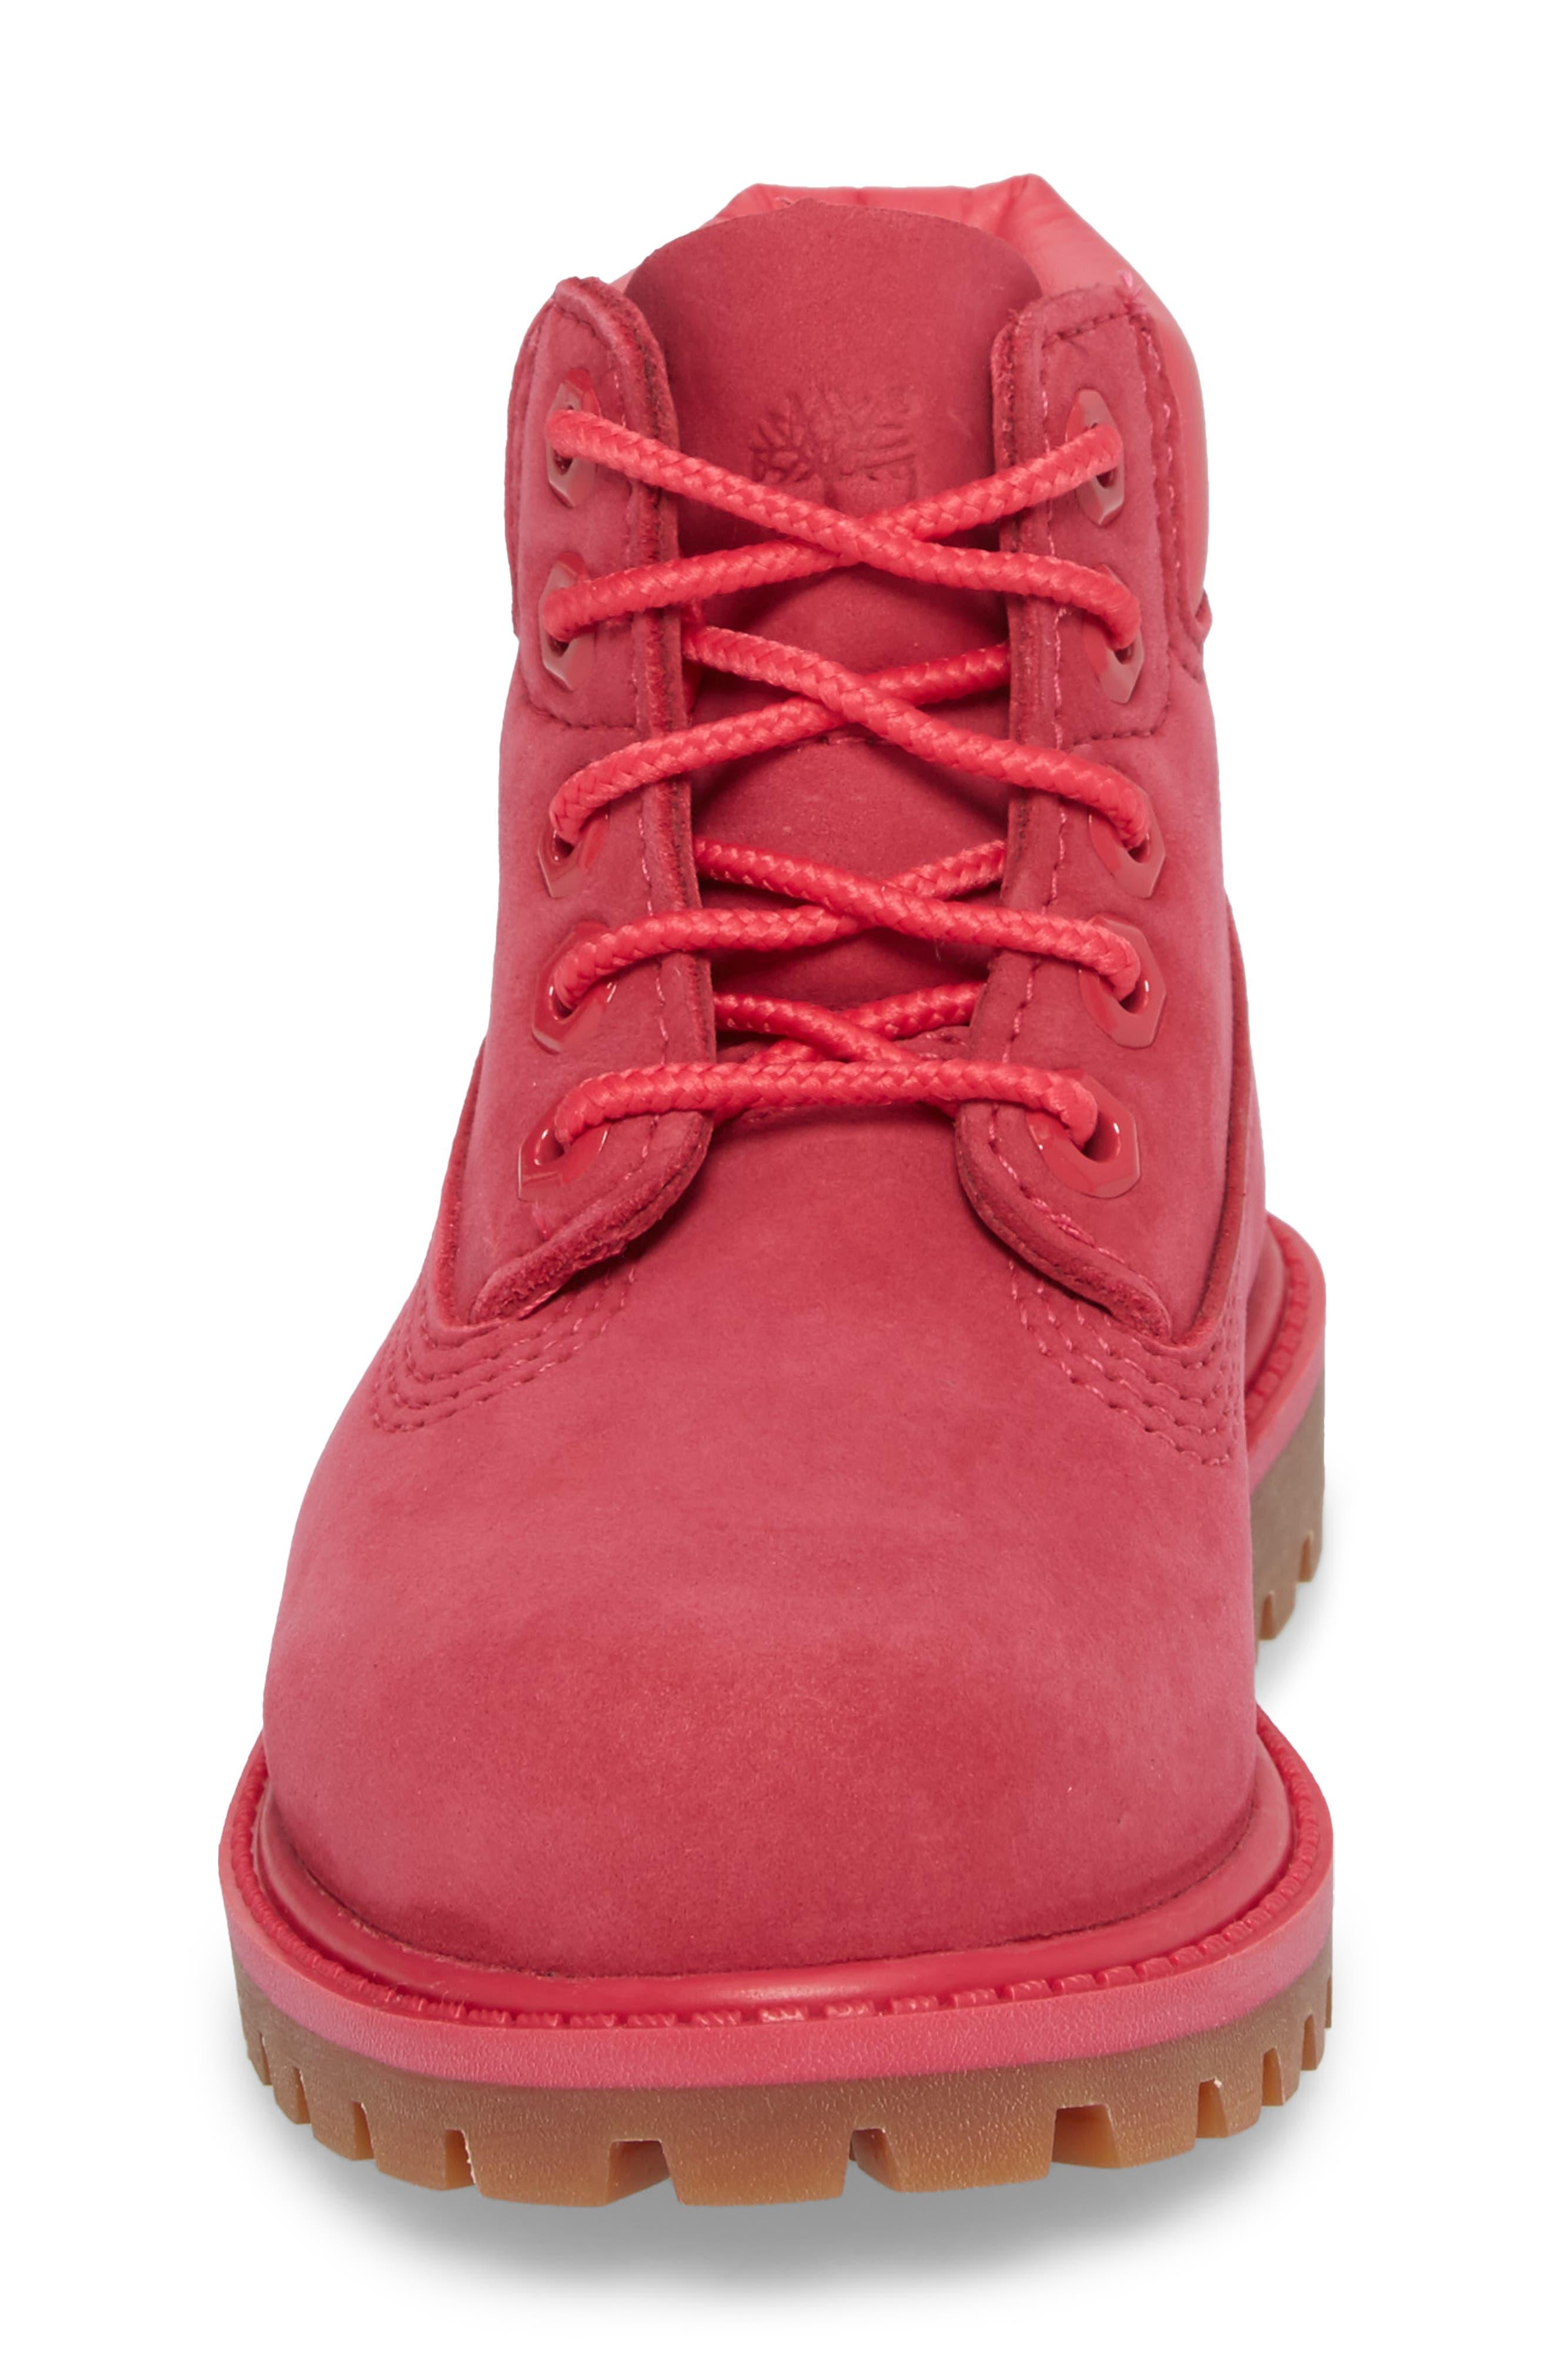 Alternate Image 4  - Timberland 6-Inch Premium Waterproof Boot (Walker, Toddler, Little Kid & Big Kid)